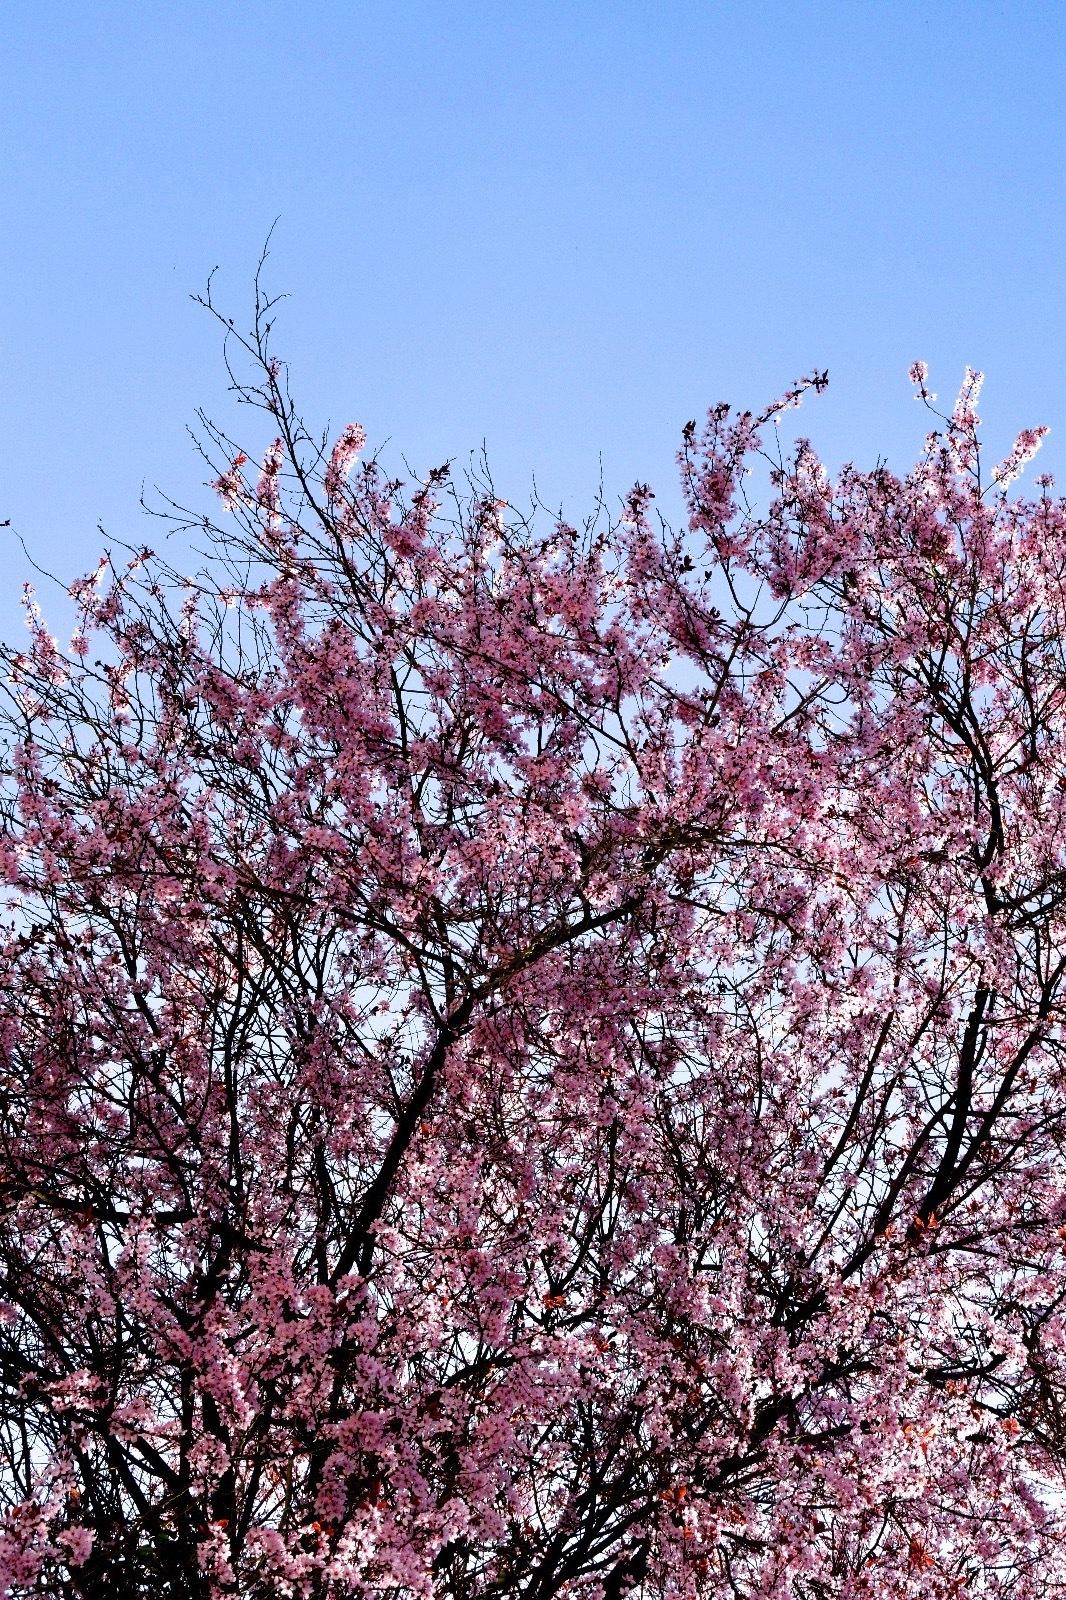 Pink Flowers by Ivana Castelo-Branco